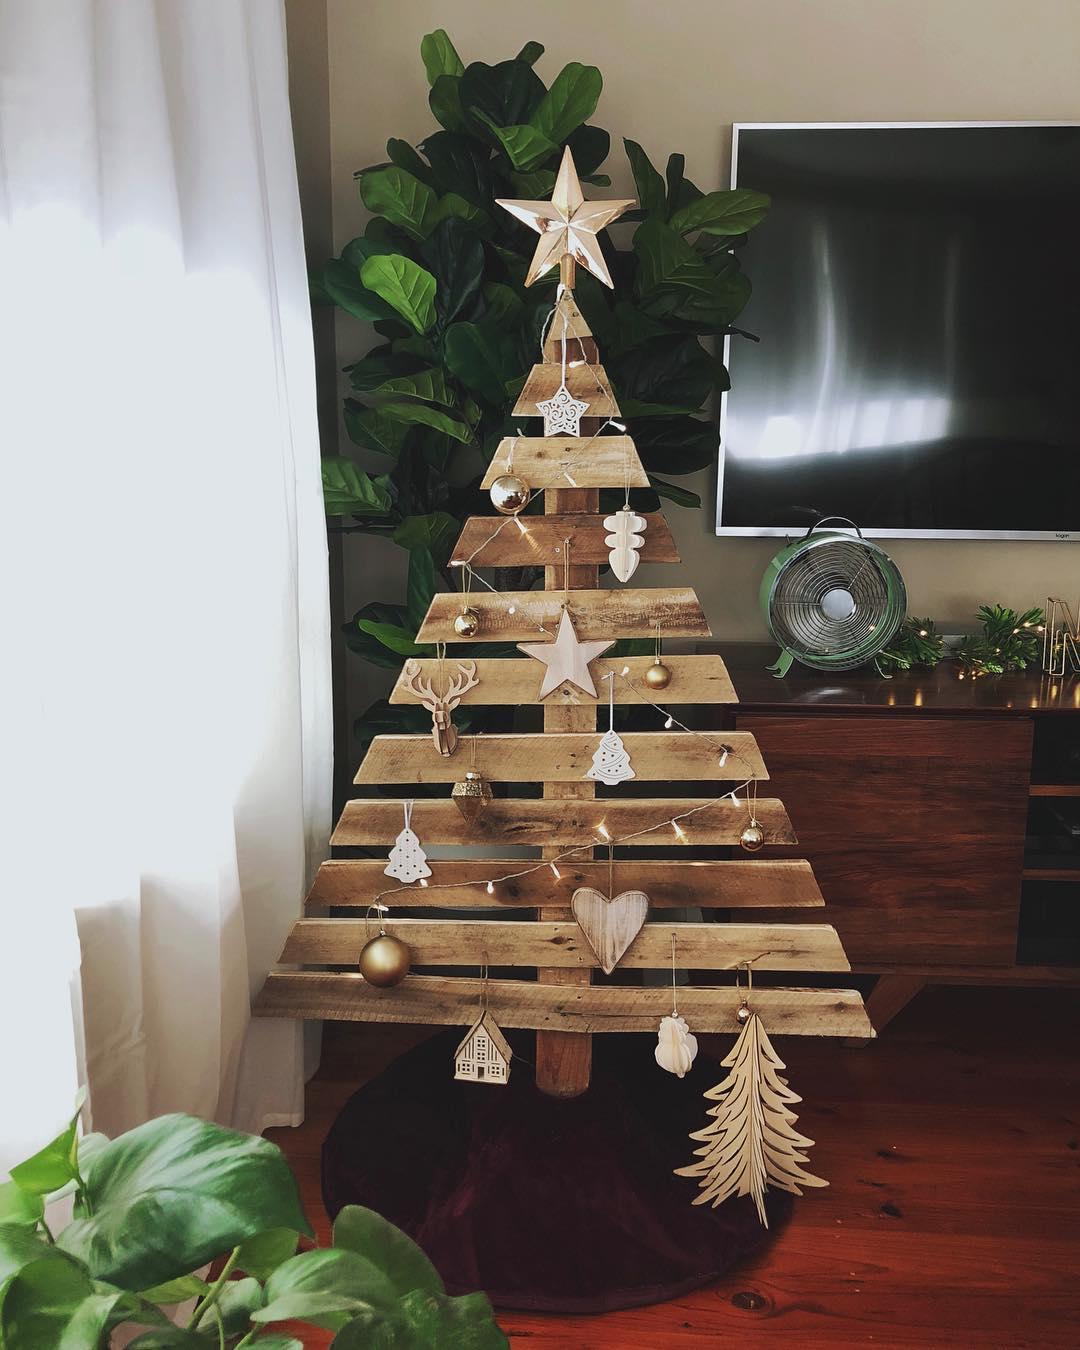 Alberi Di Natale Originali.Alberi Di Natale Originali 20 Idee Incredibili